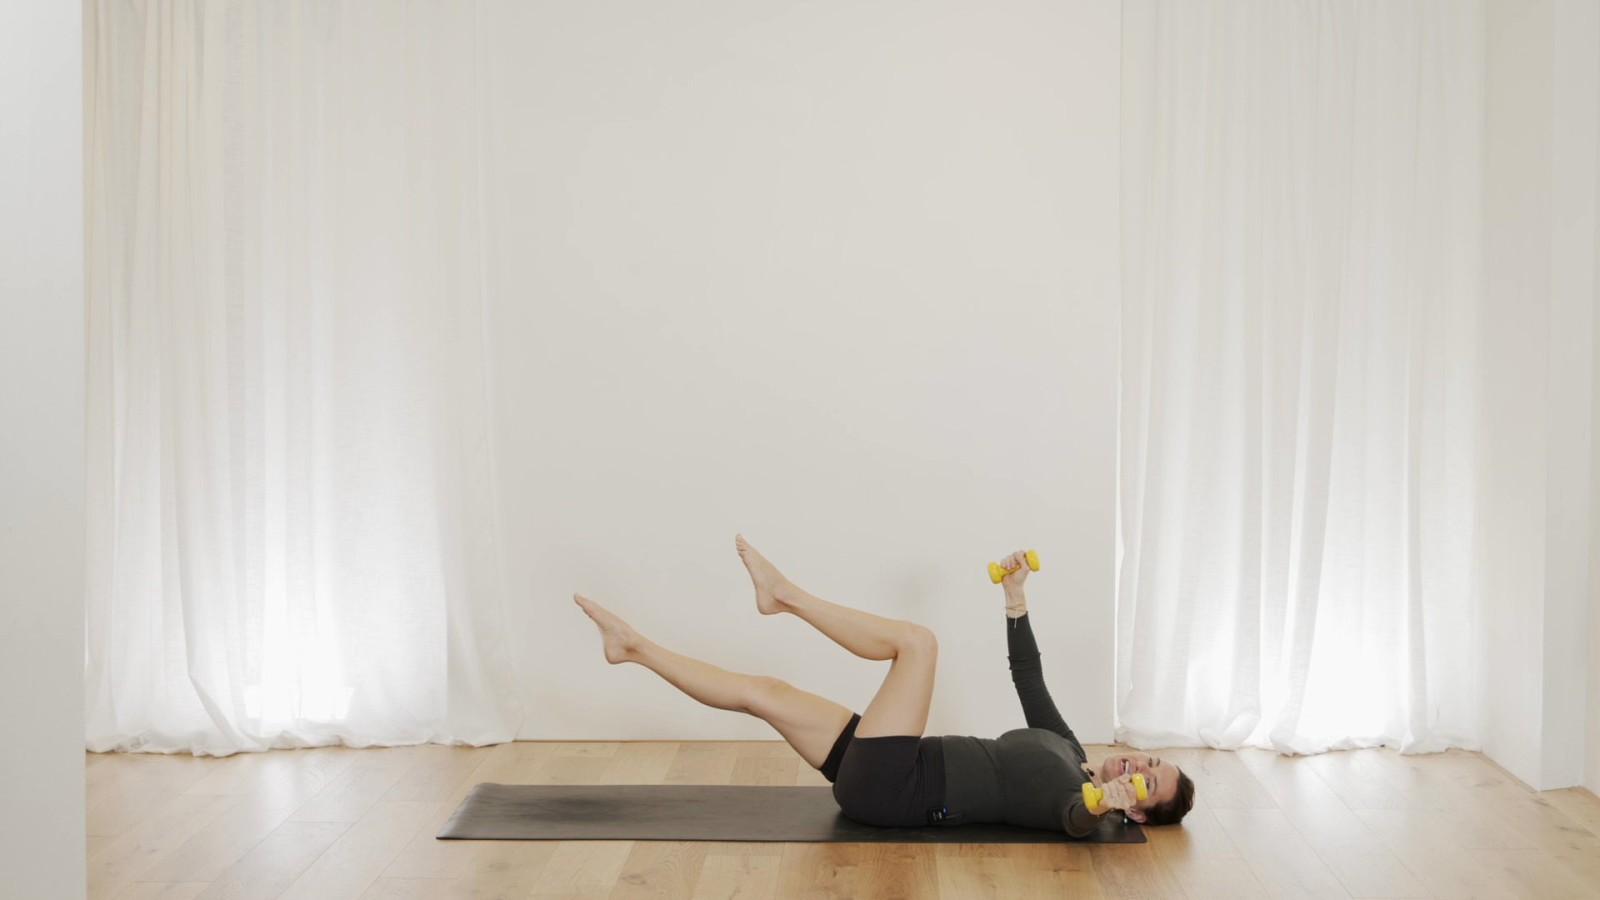 Abs & Arms Pilates Workout with Aneta Bachanova